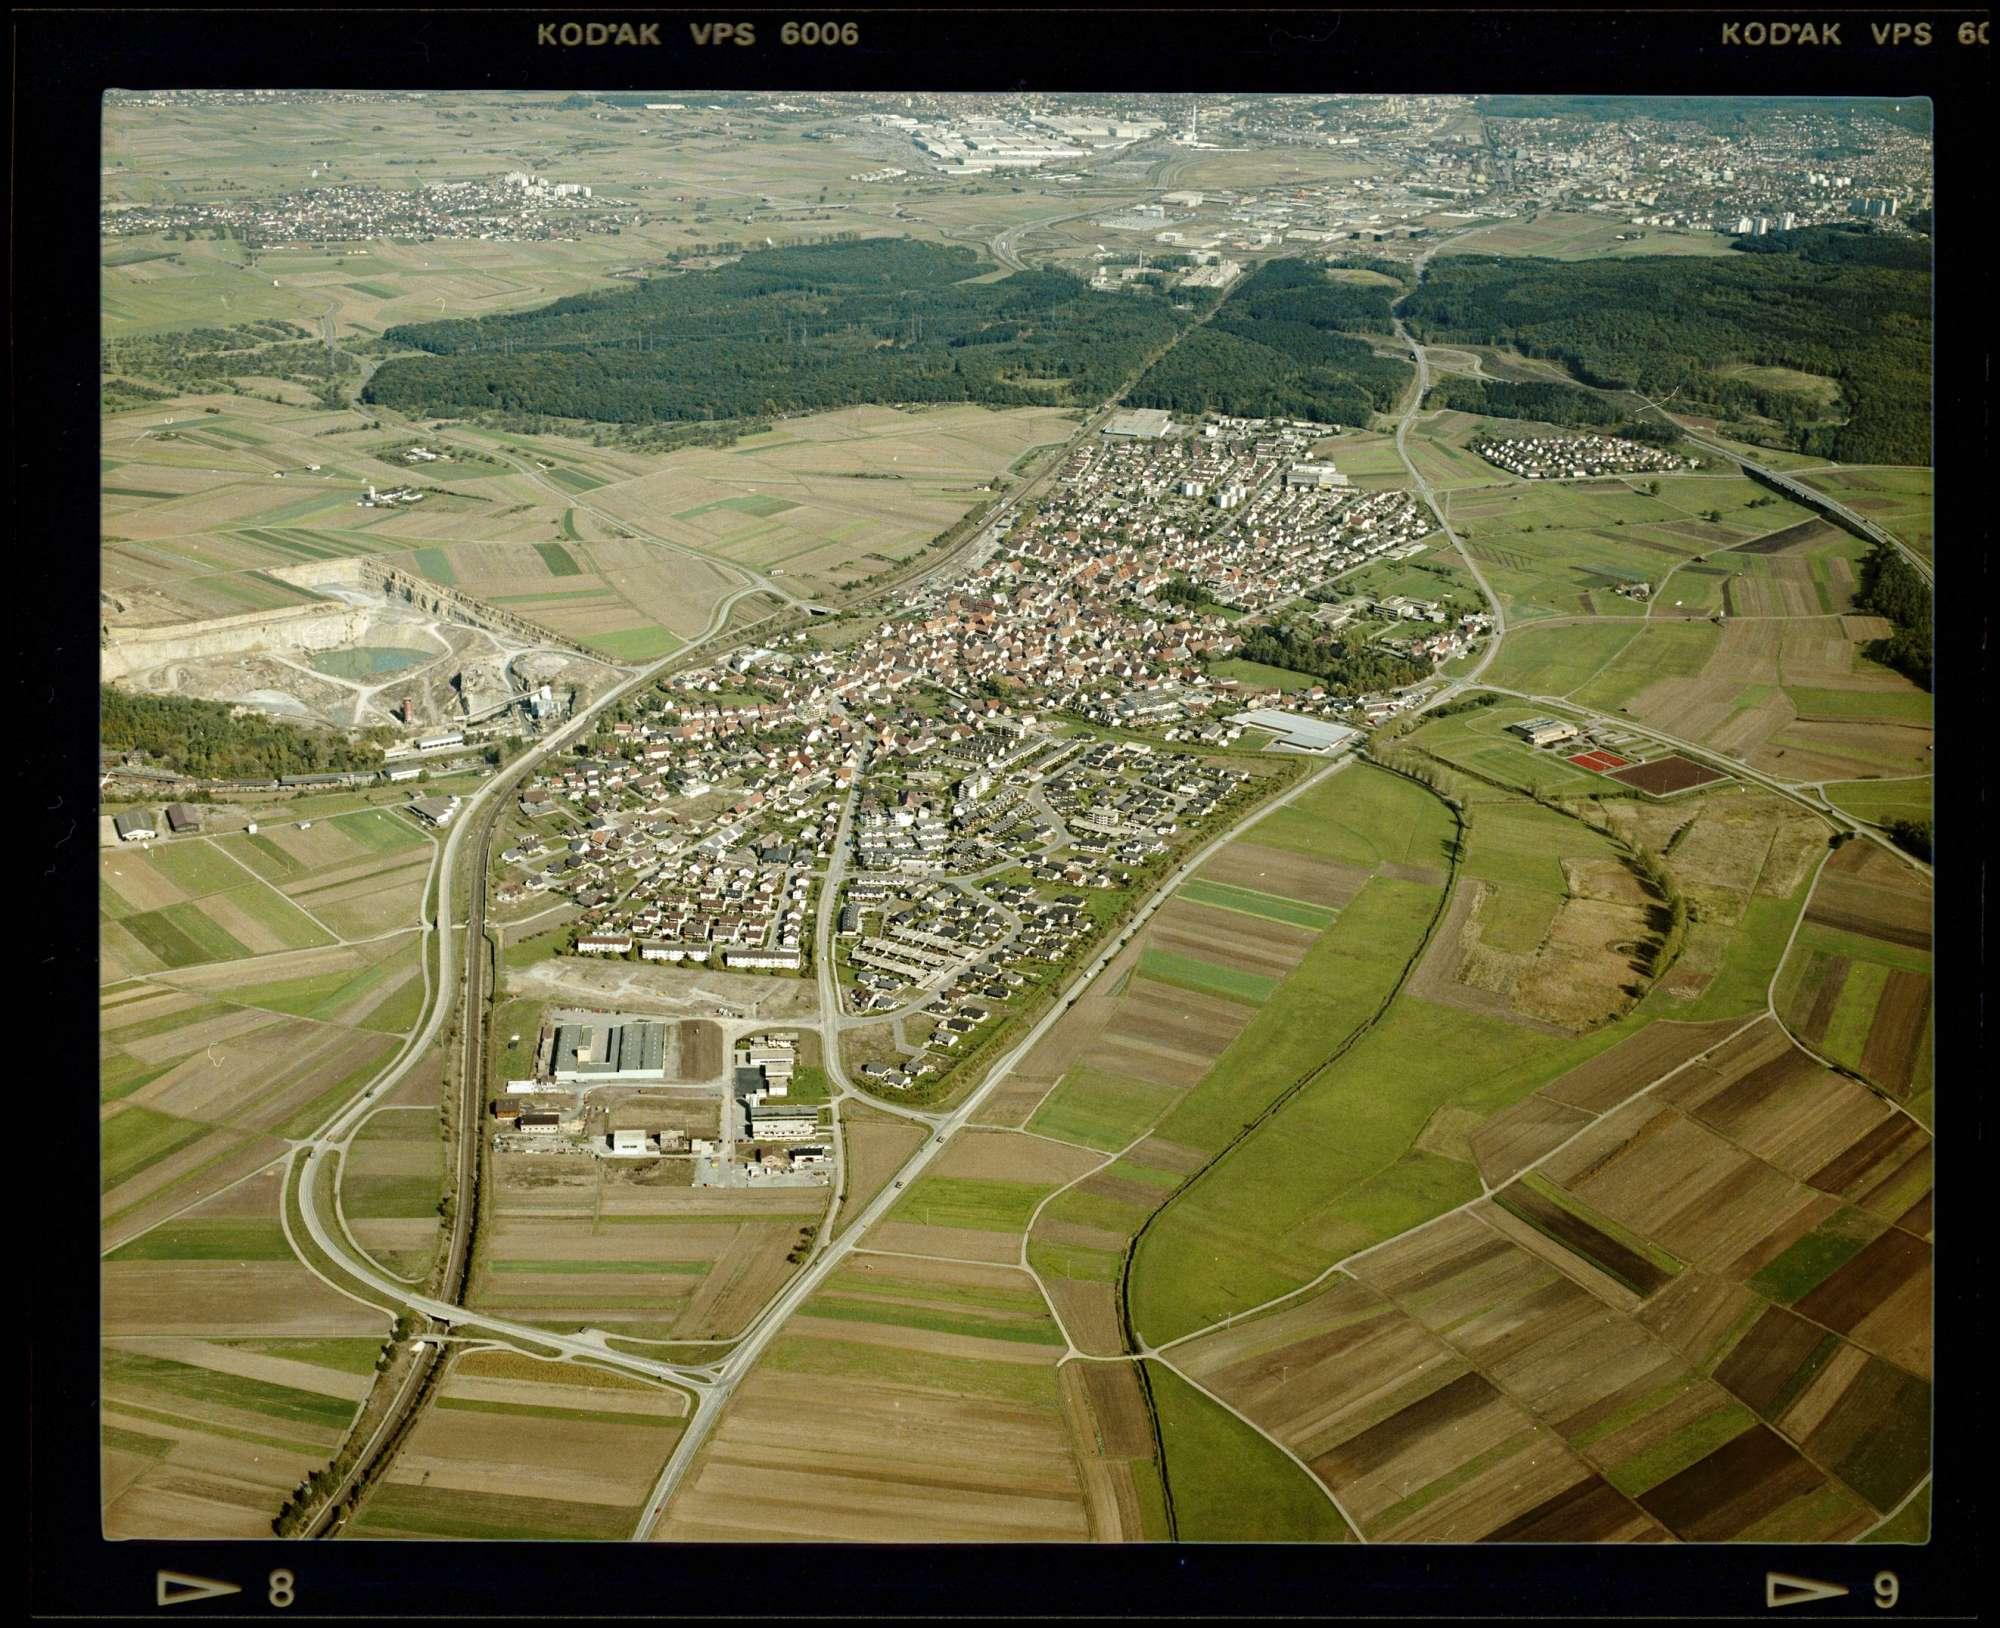 Ehningen, Luftbild, Bild 1